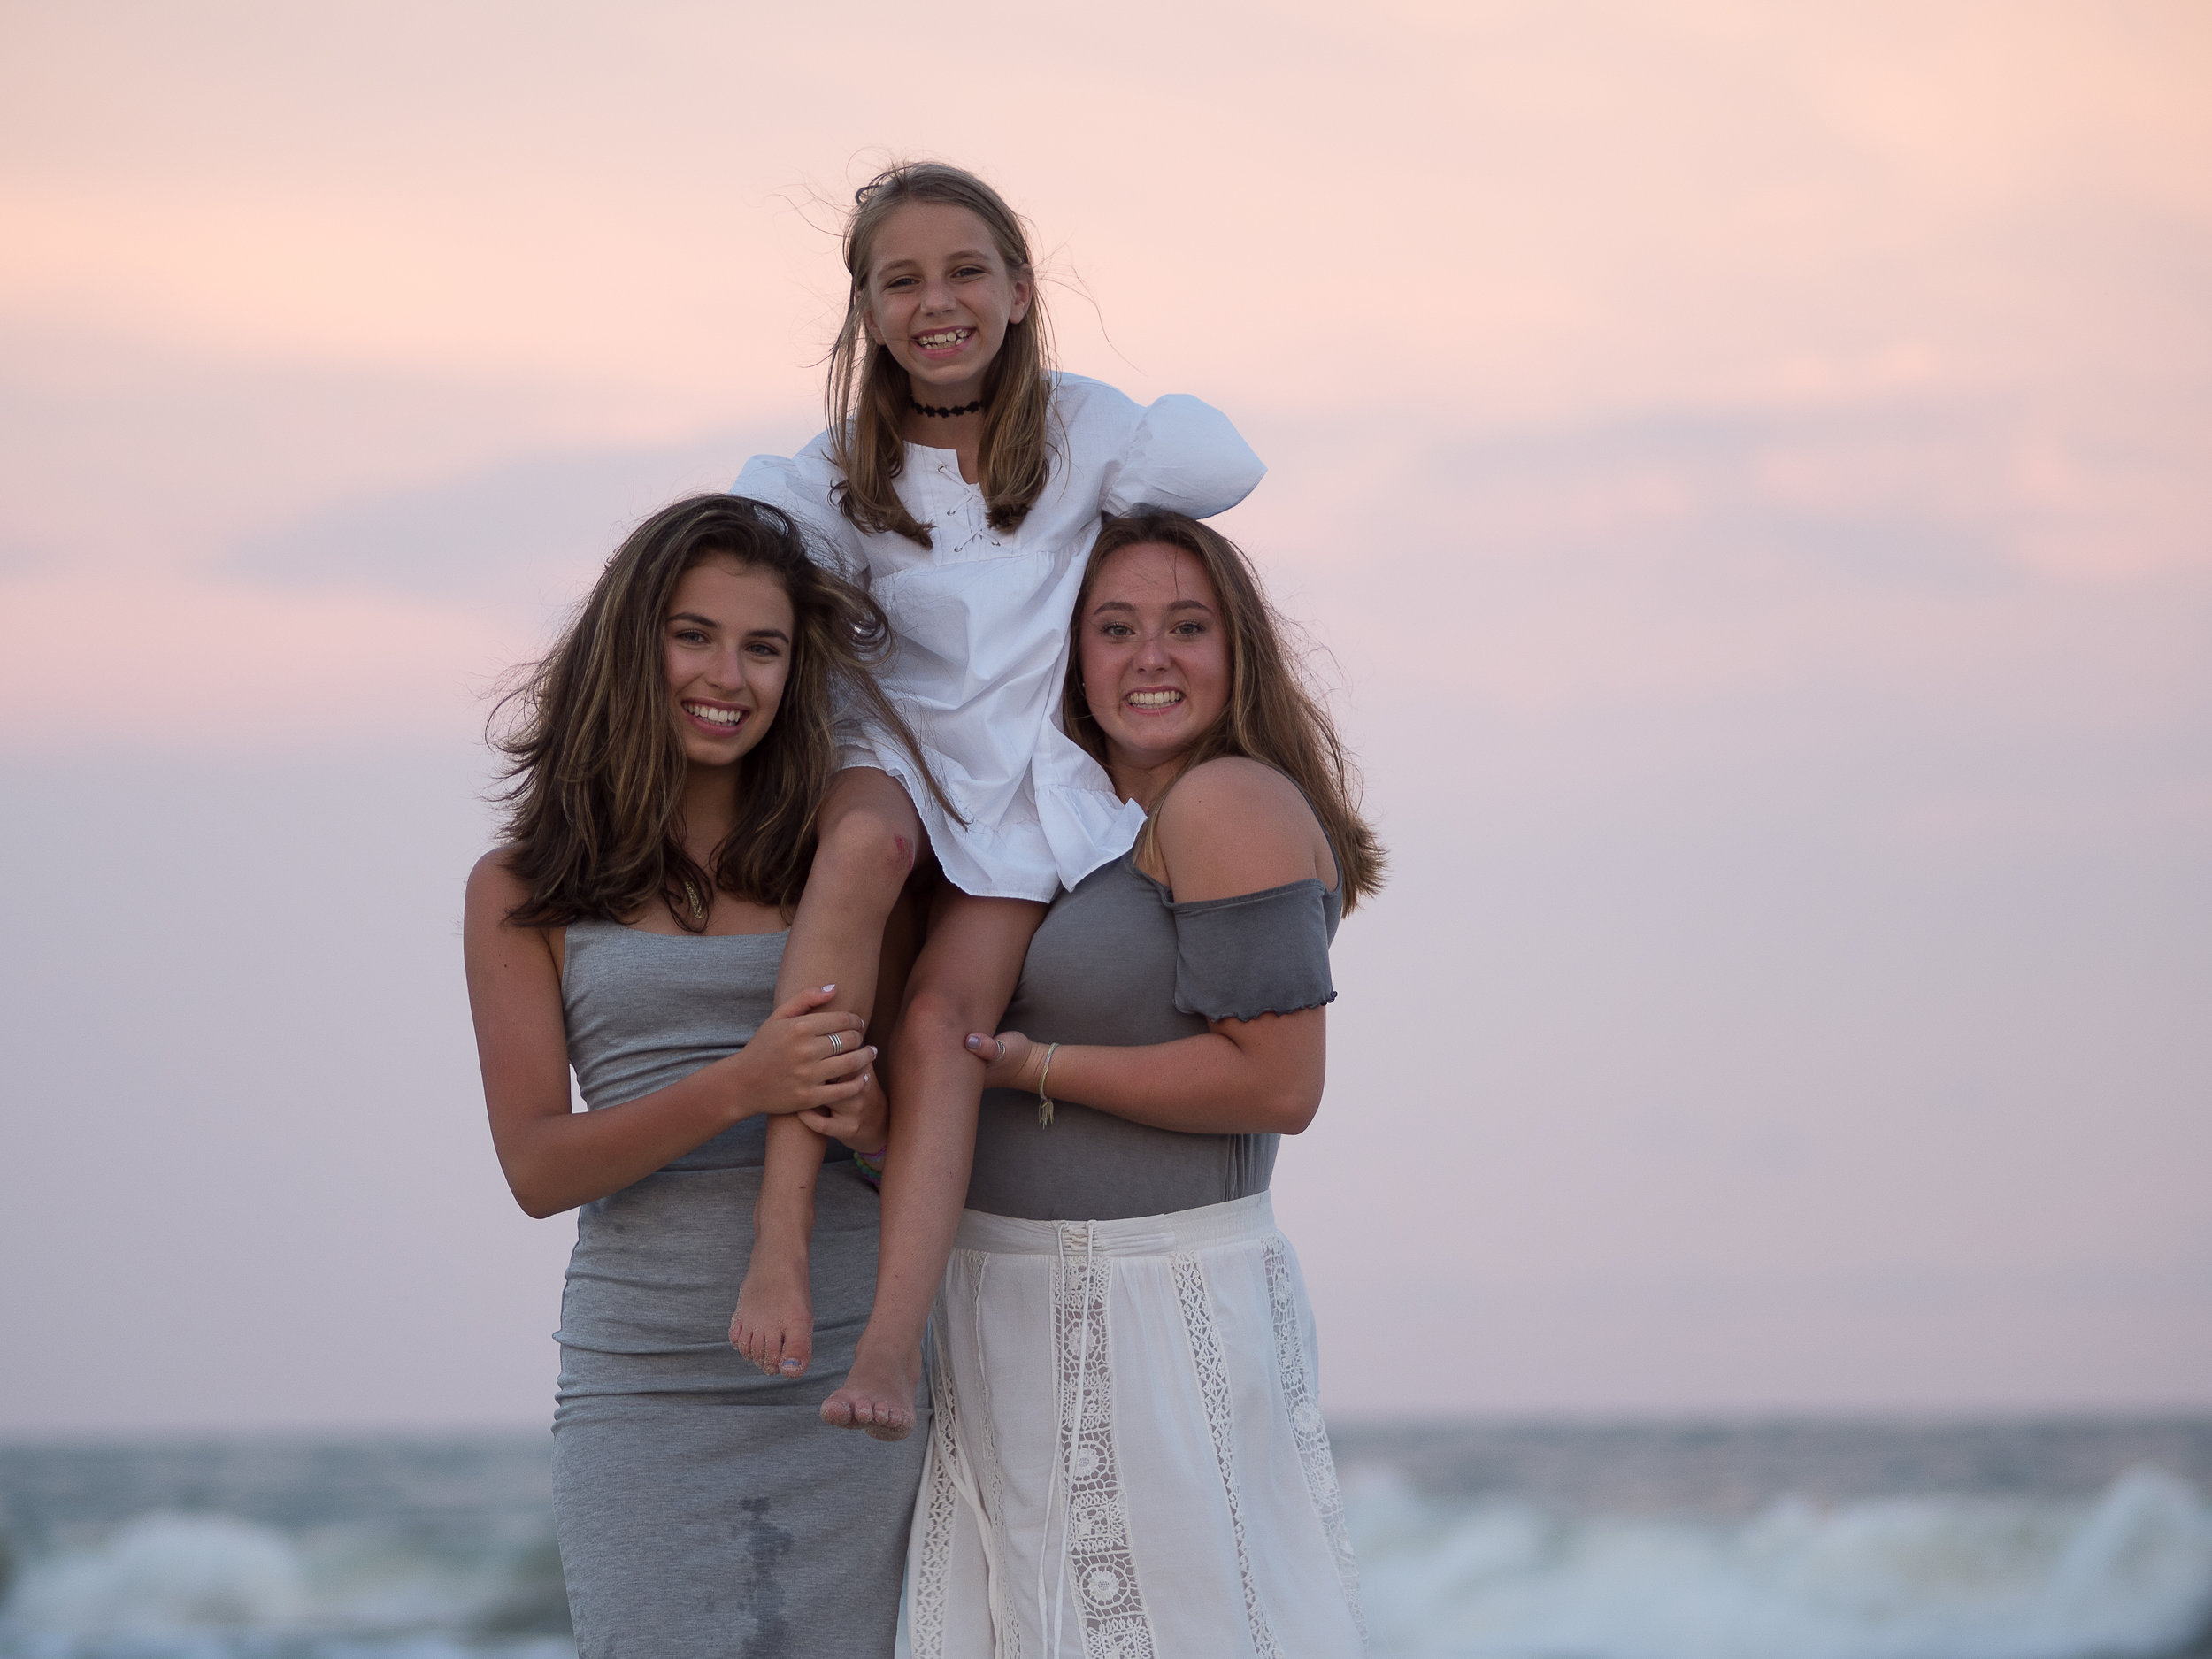 - Cousins at the beach with ocean in background. Ocean Isle Beach, NC.